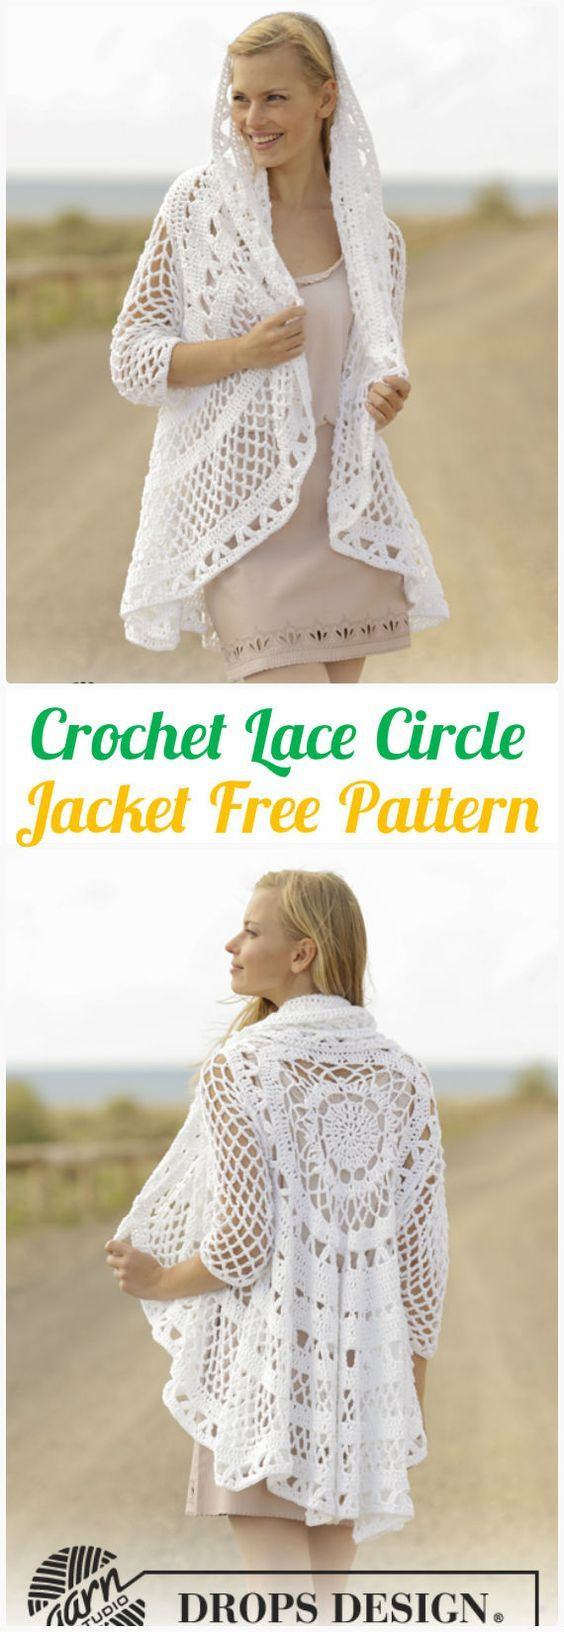 Circle Sweater: DIY Crochet Circular Vest Sweater Jacket Free Patterns